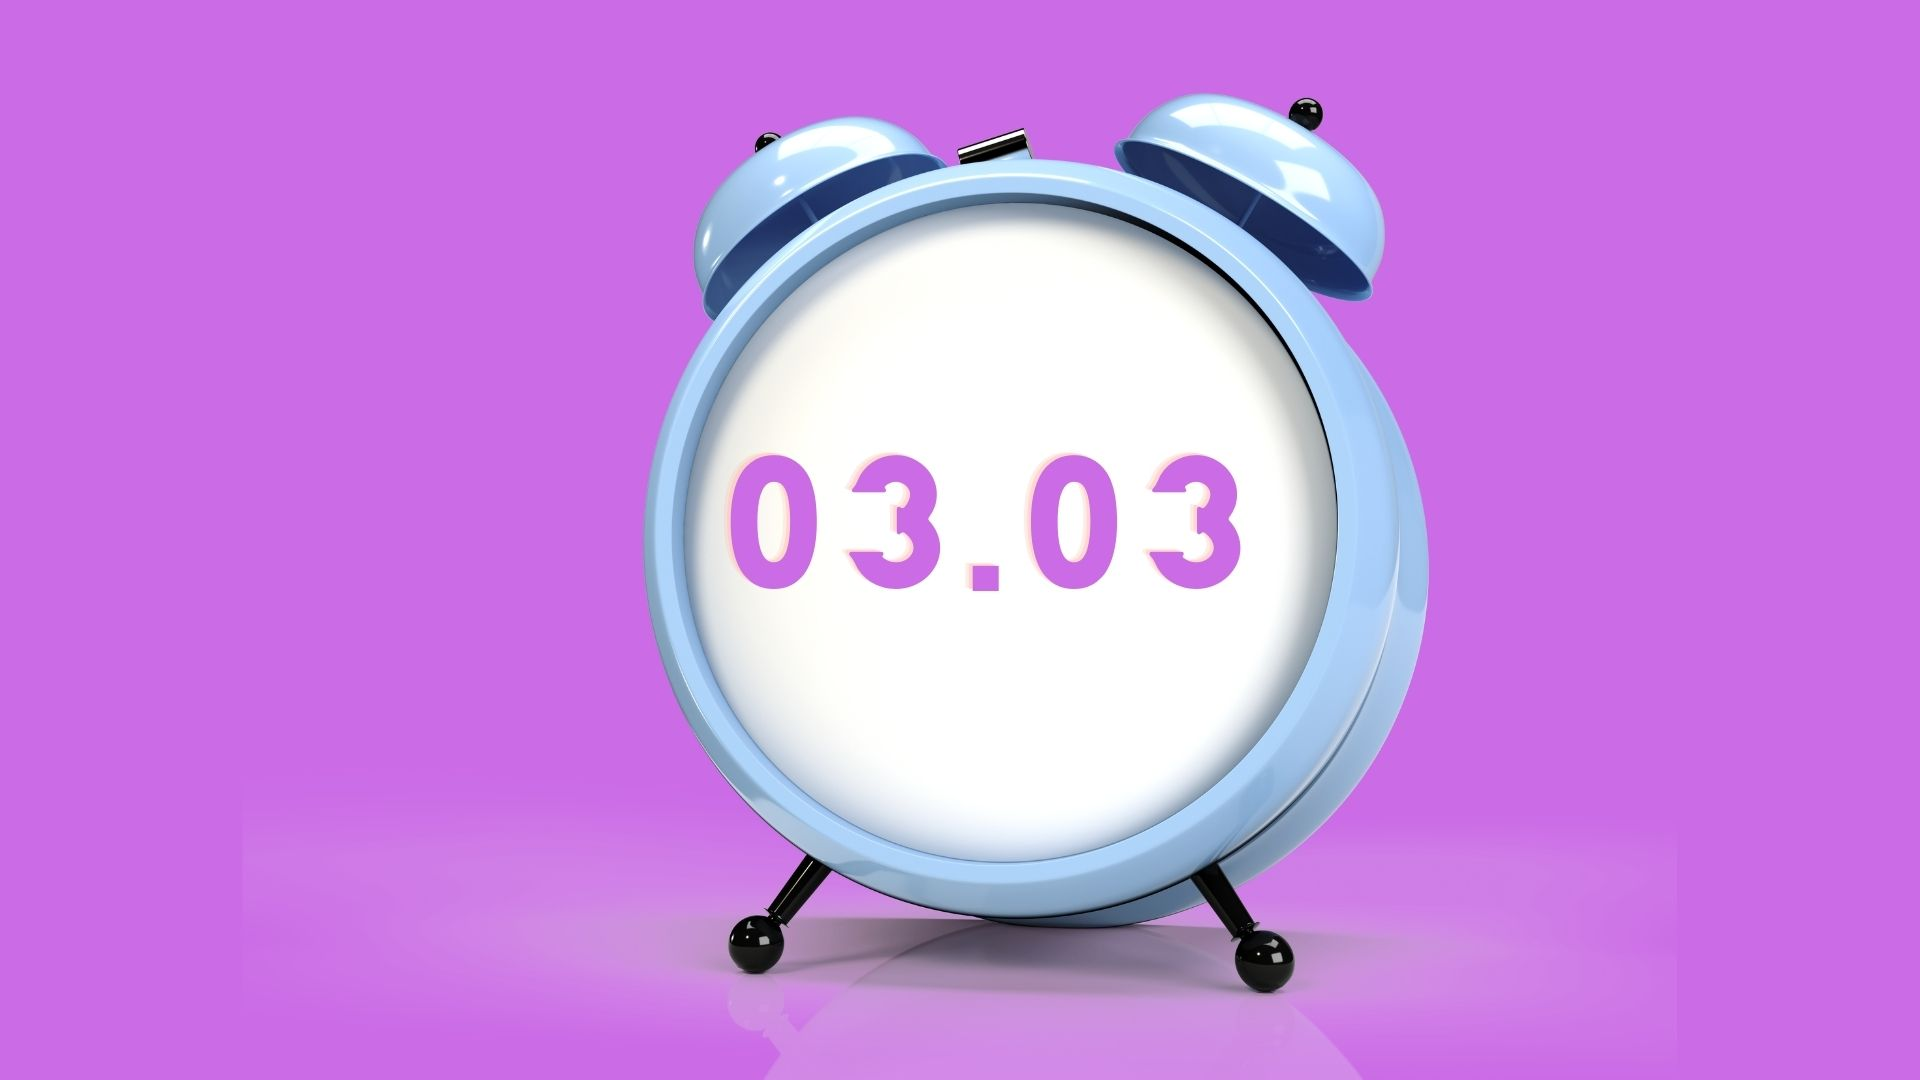 03.03 Saat Anlamı